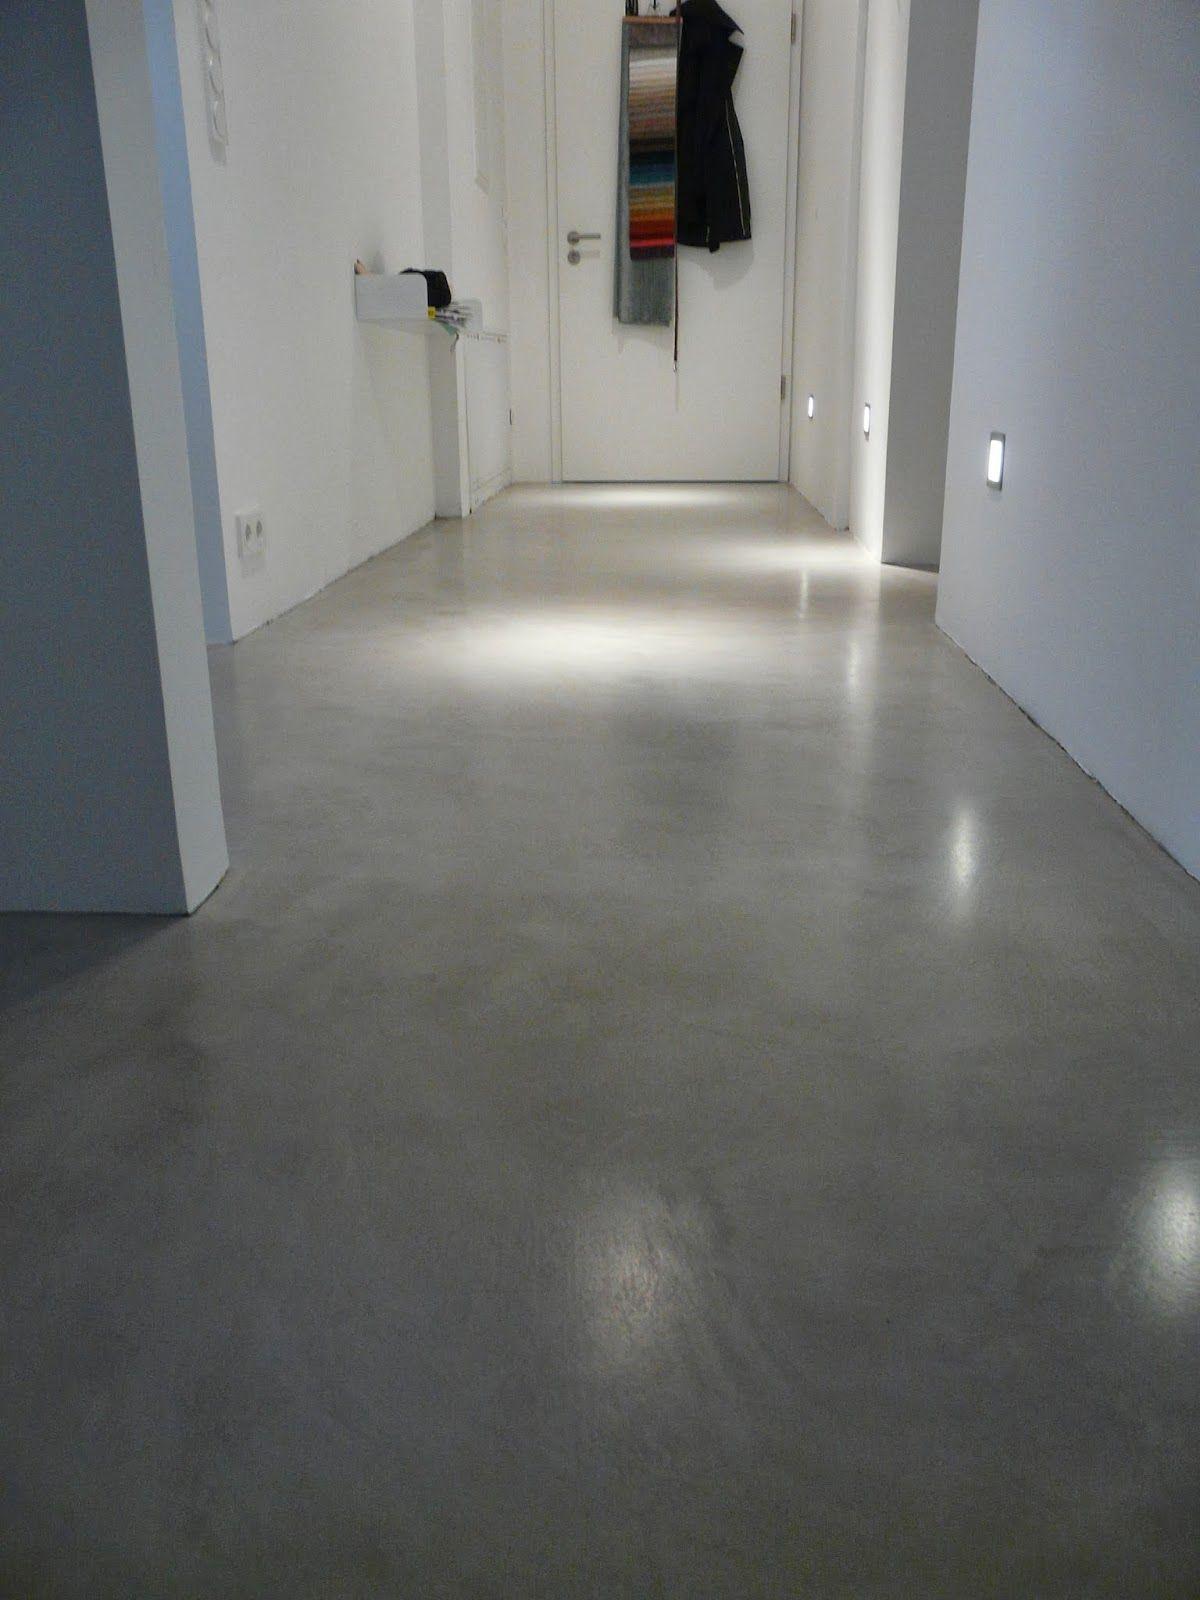 Beton Cire Beton Floor Preise Betonoptik Microtopping Kosten Kaufen Preise Verarbeitung Fugenlose Boden Microzeme Beton Putz Betonfussboden Beton Cire